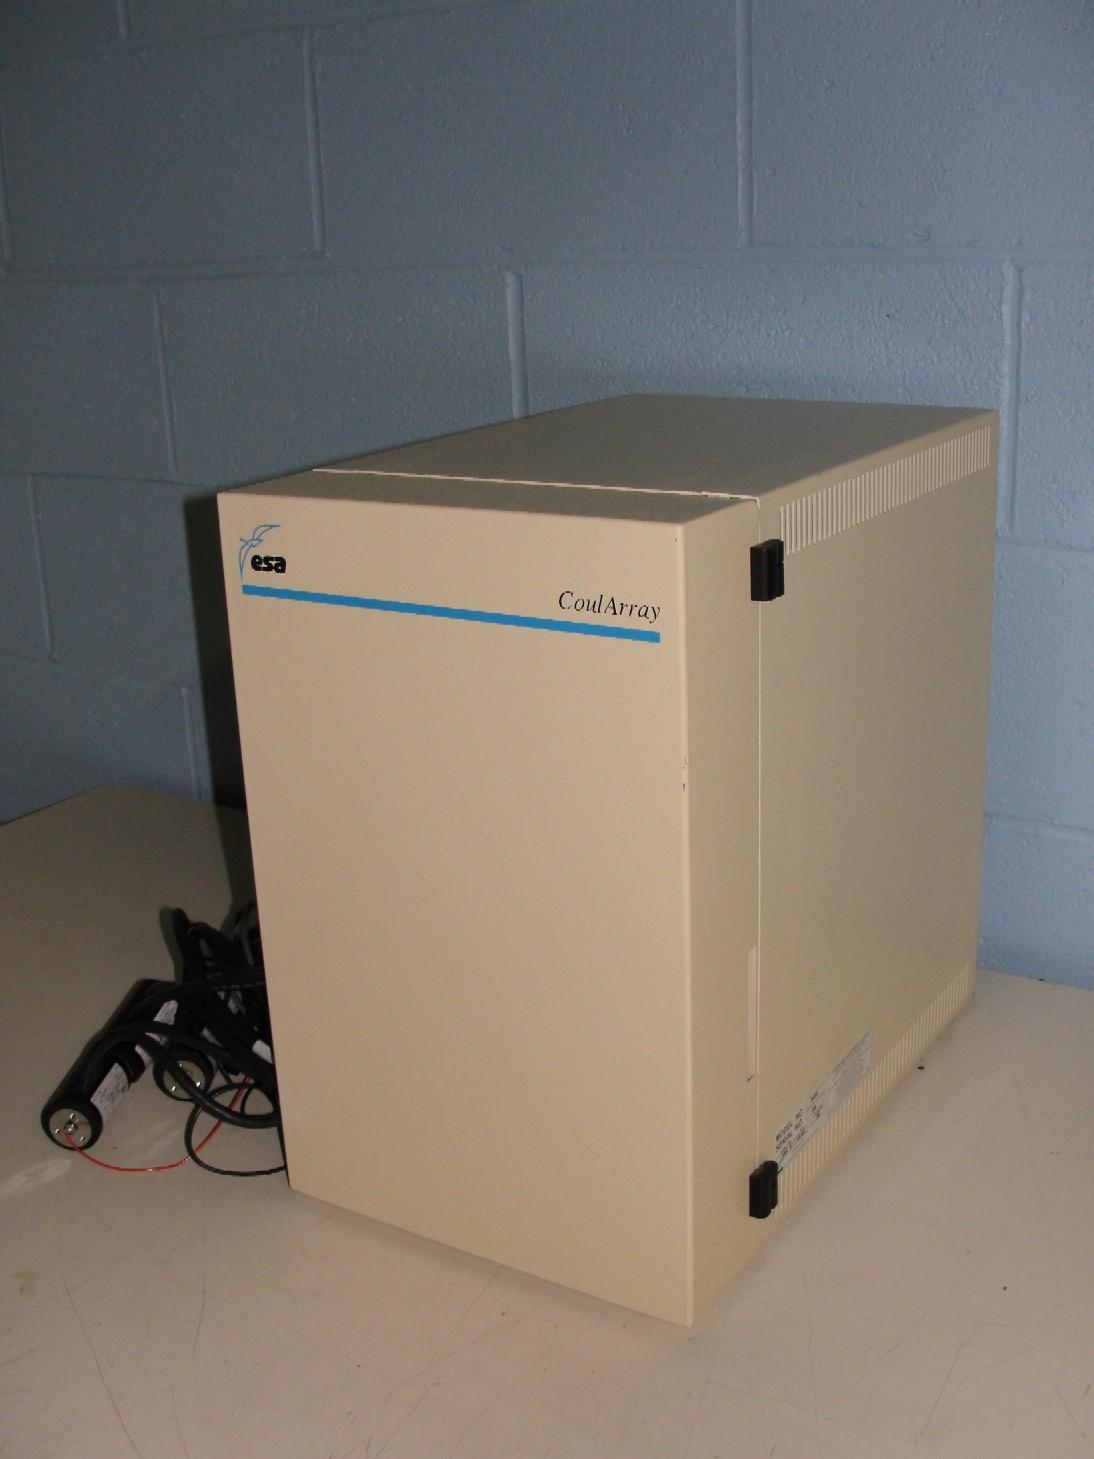 ESA Coularray Detector Model 5600 Image